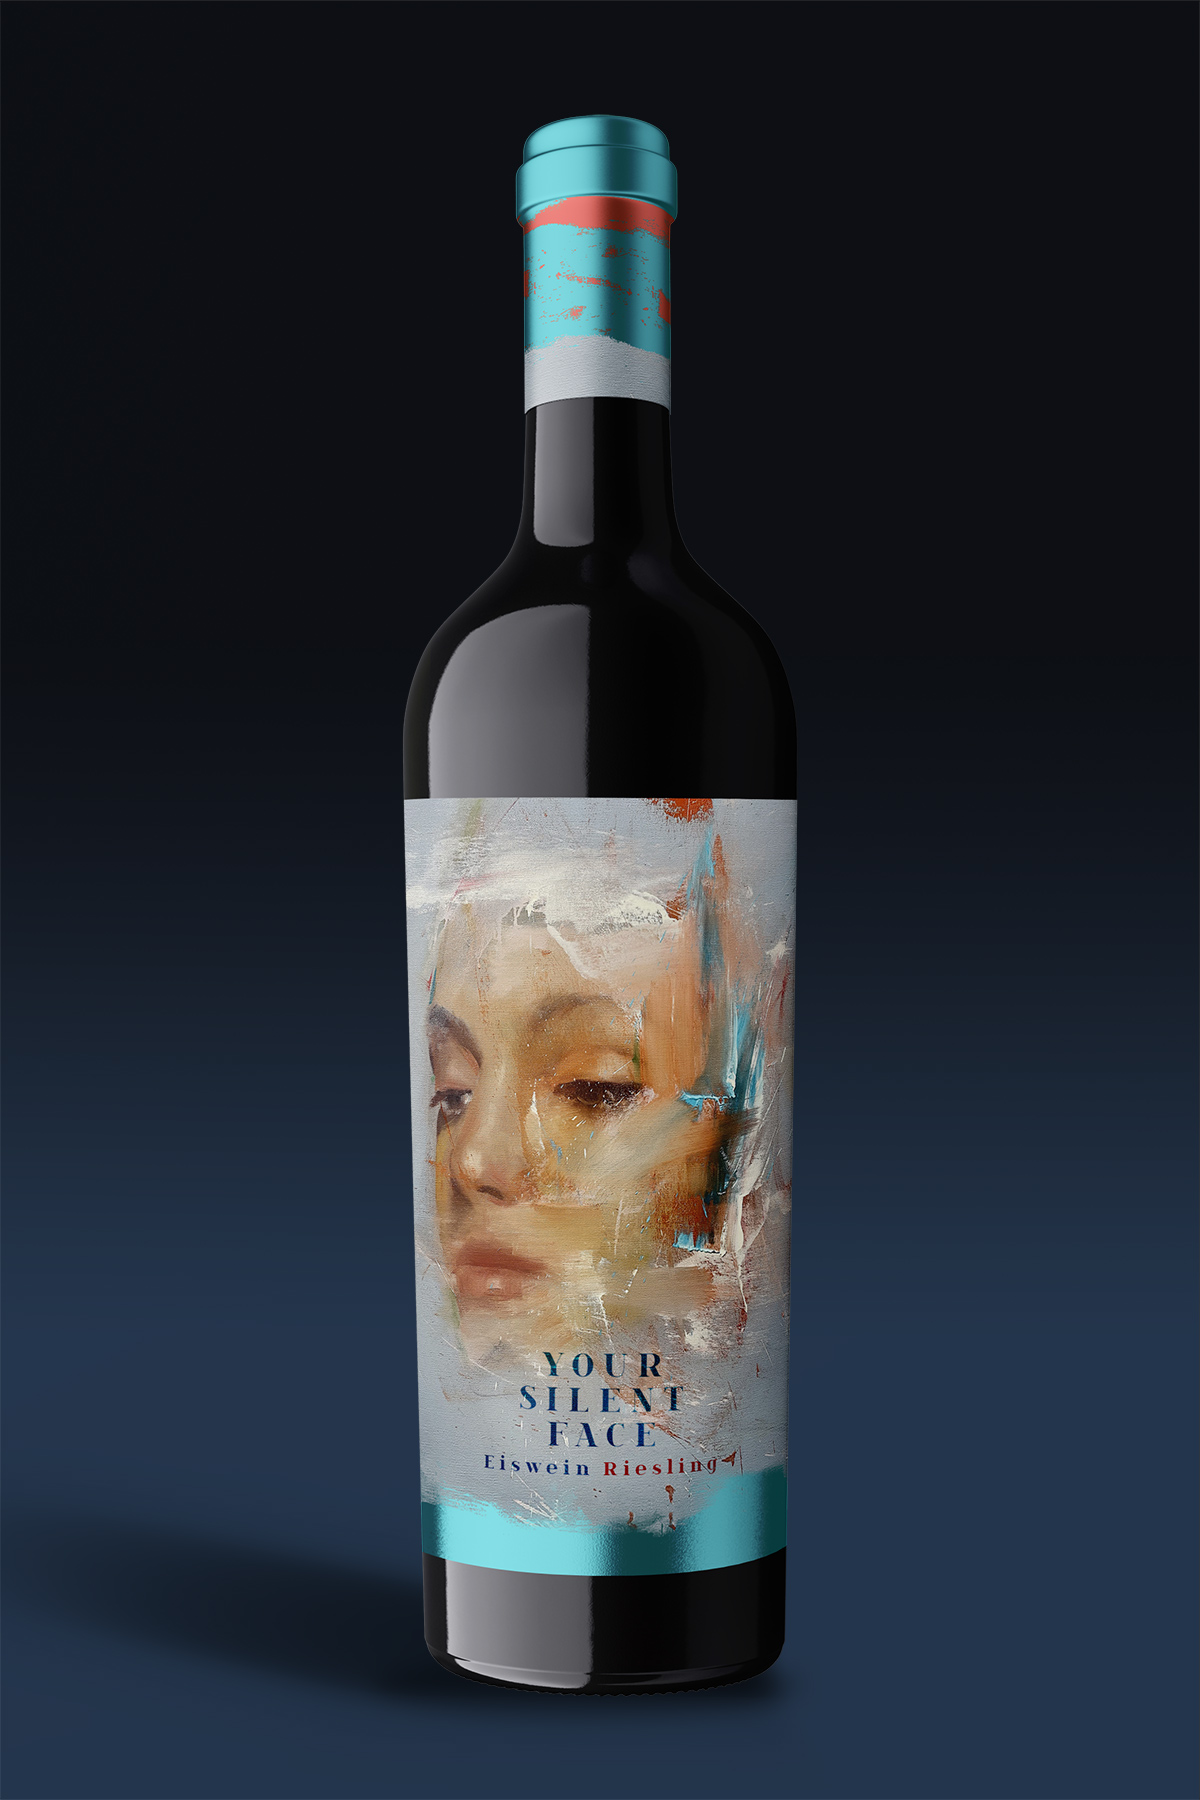 design-of-wine-bottles-1